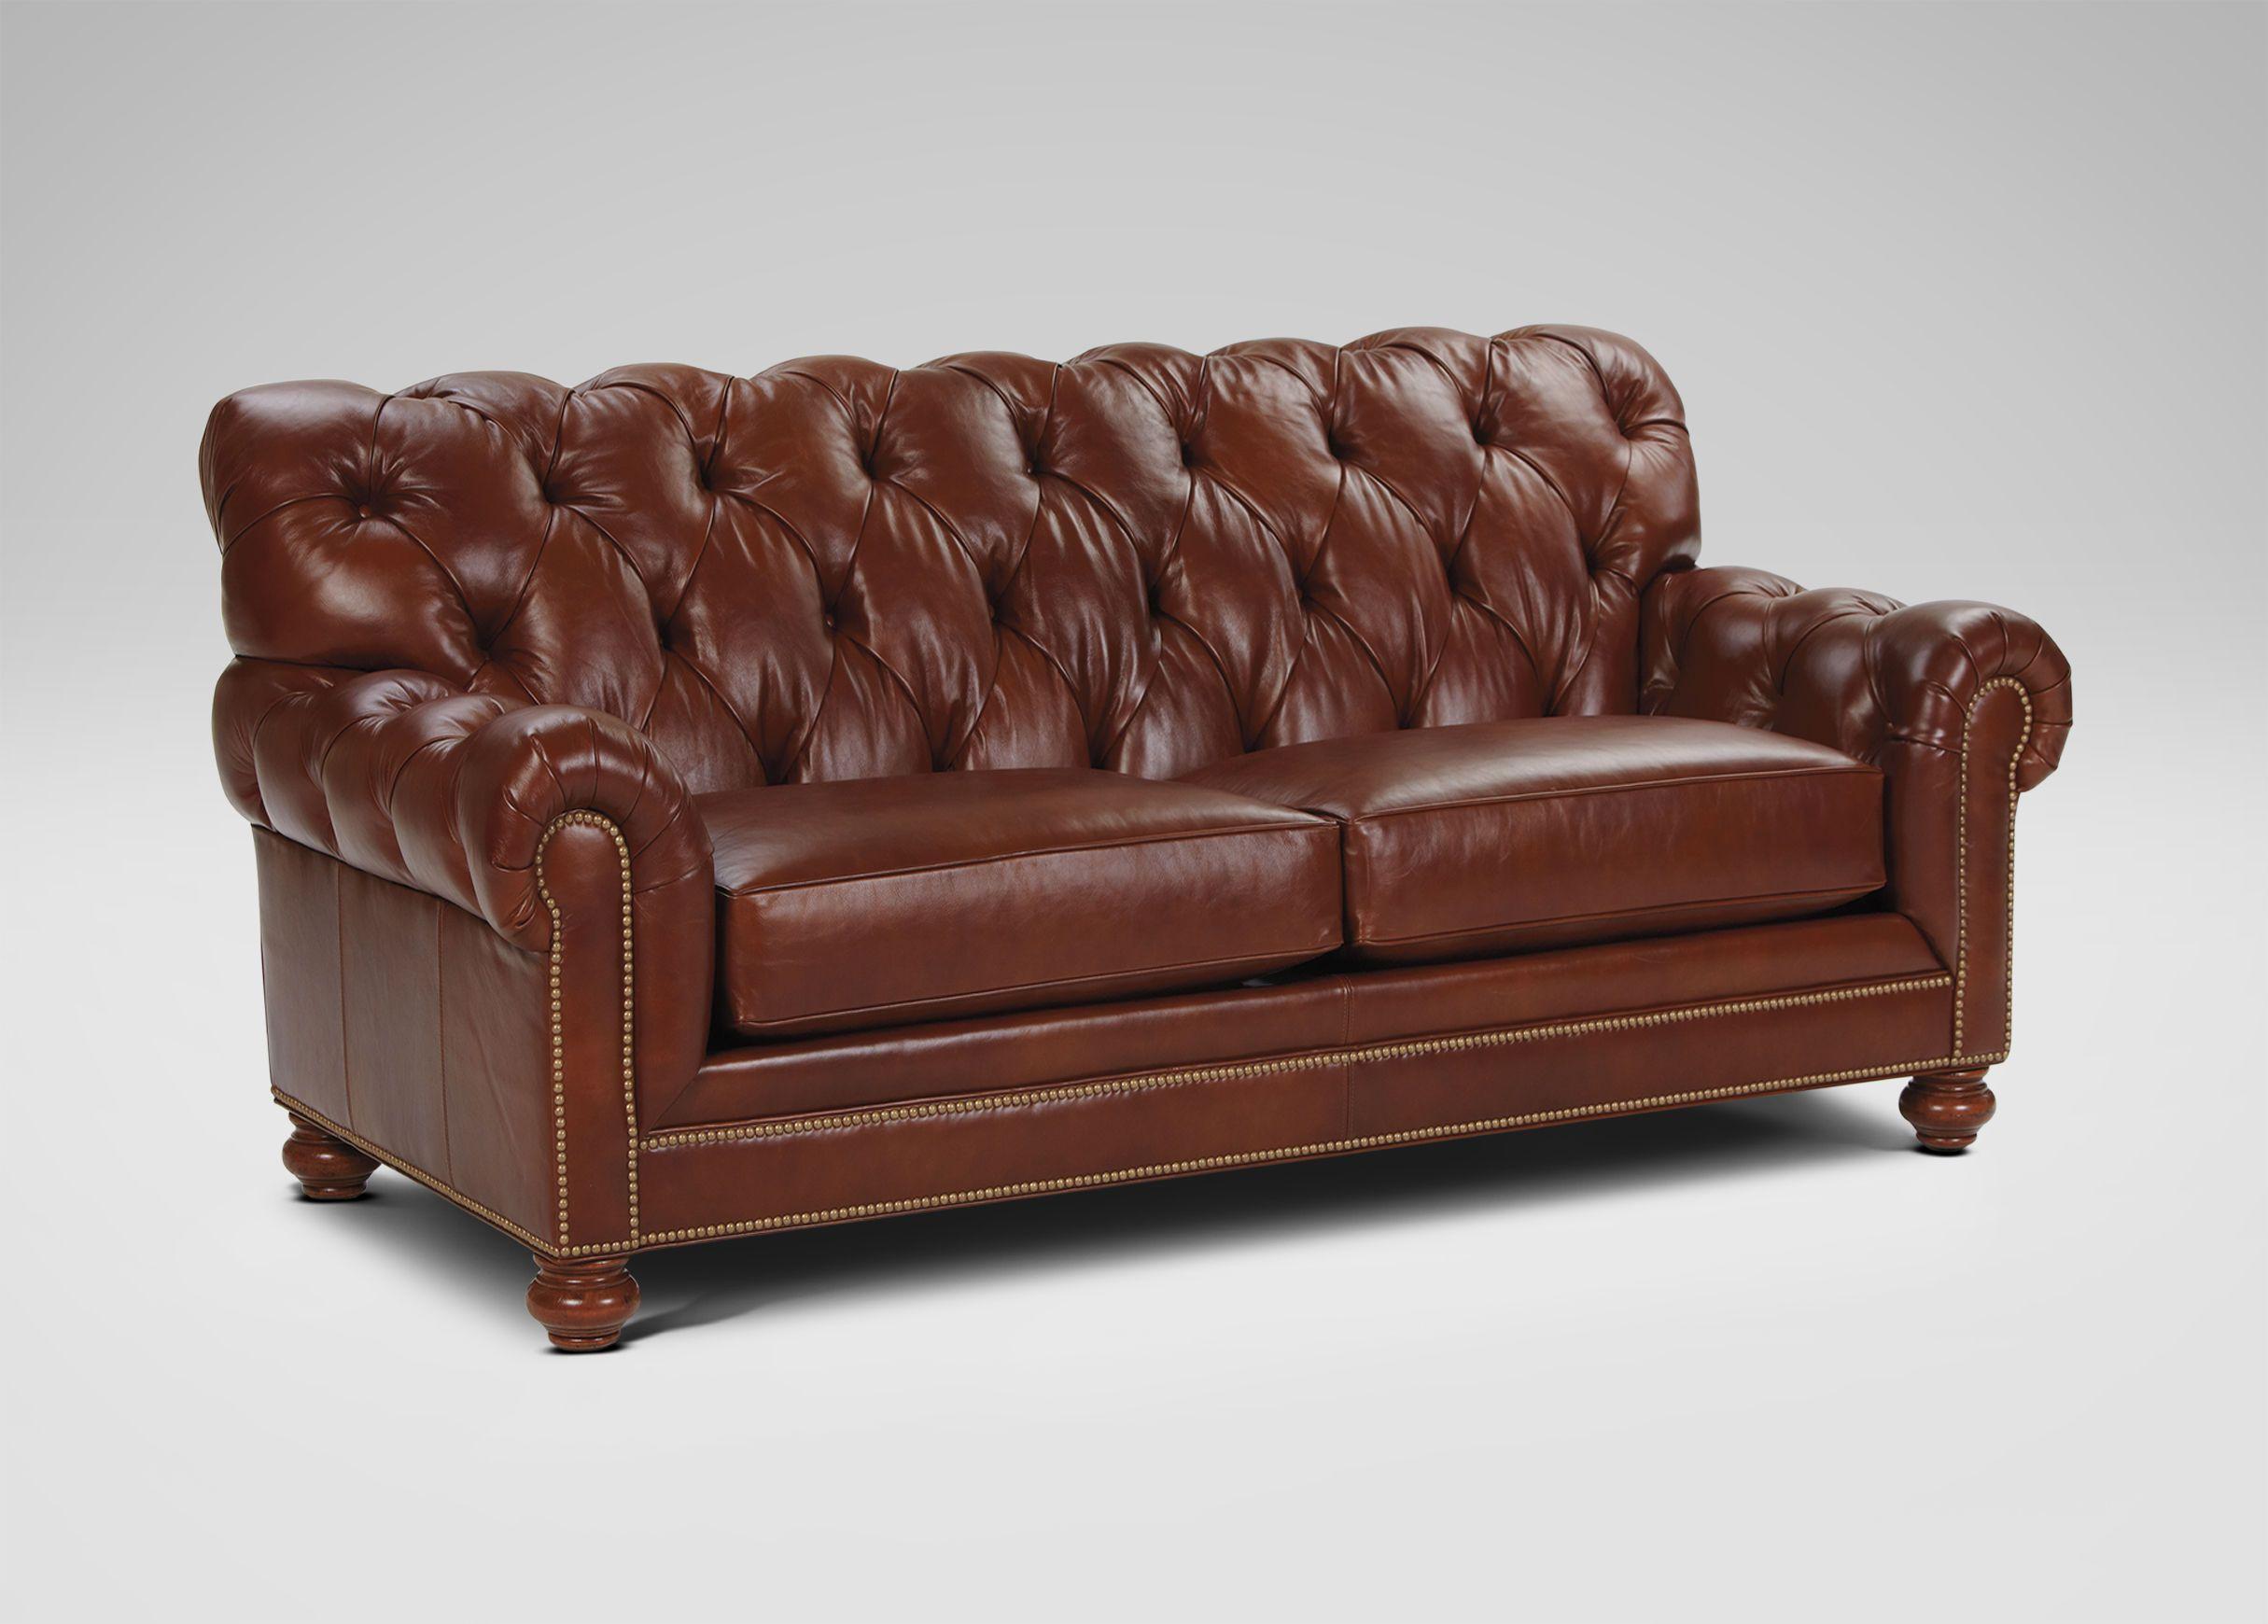 Chadwick Leather Sofa Old English Saddle